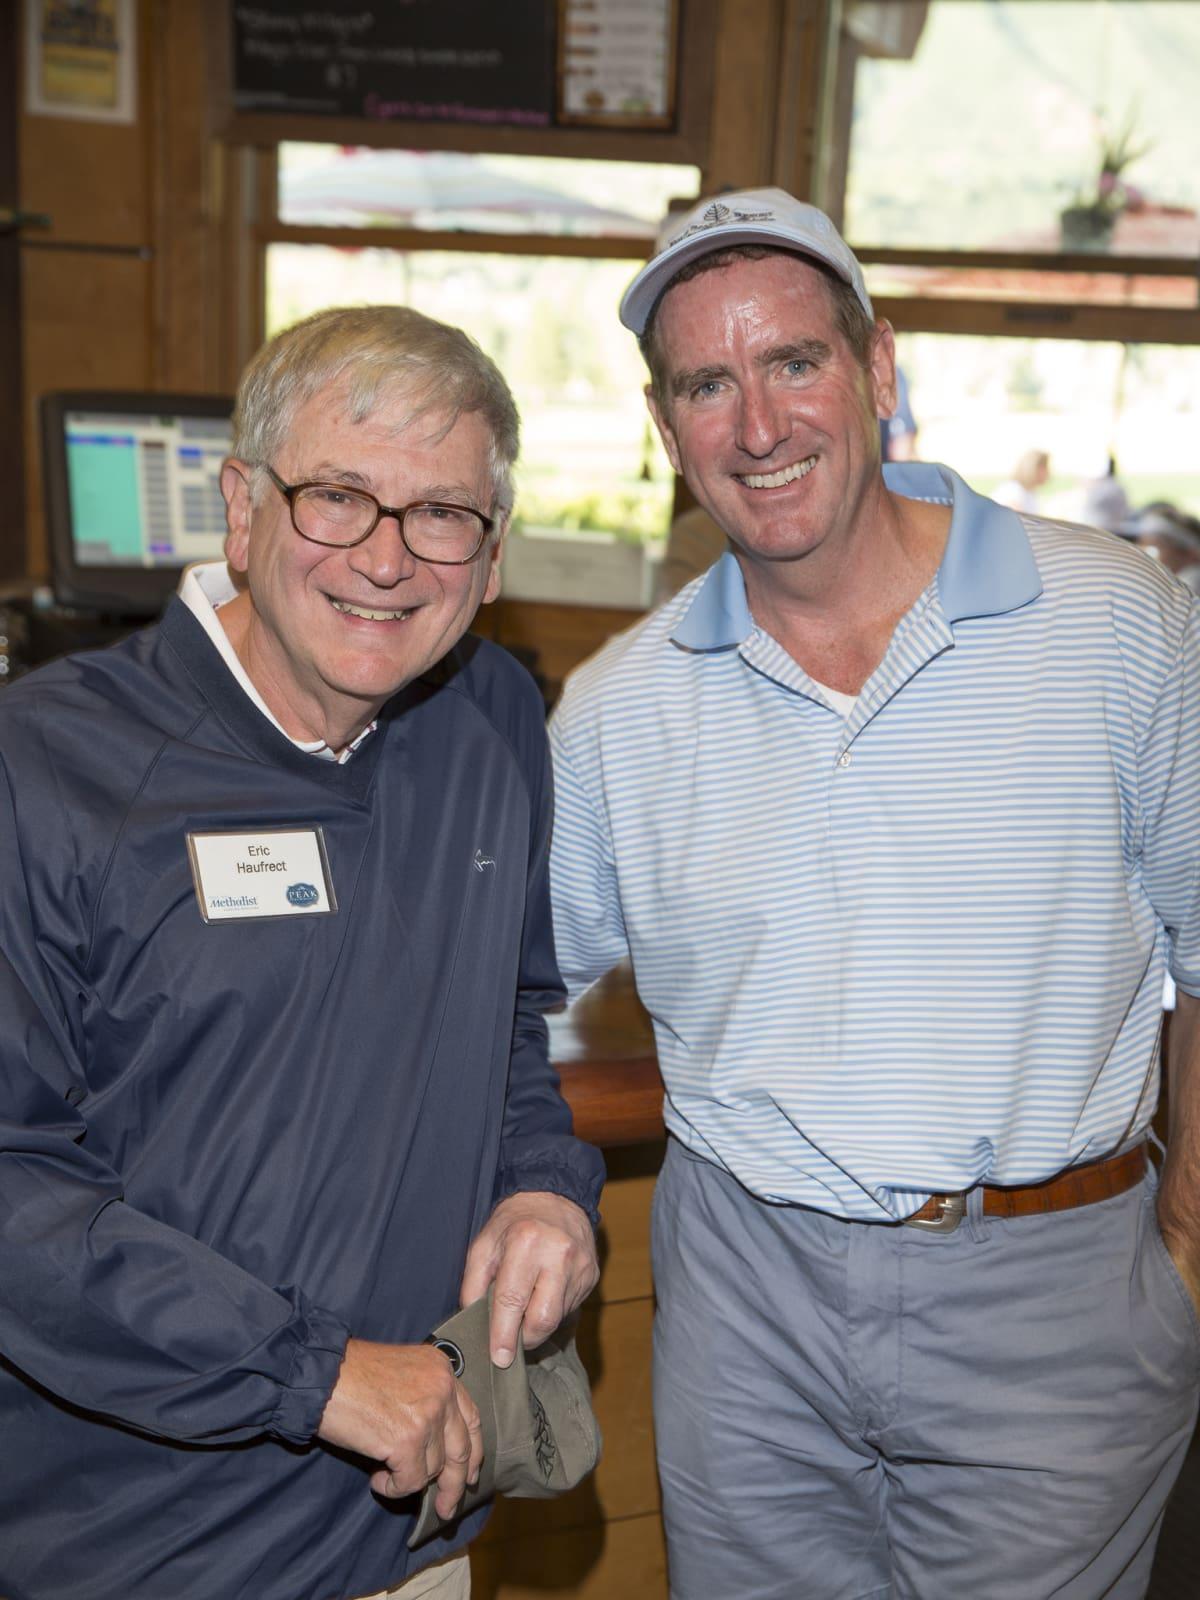 Houston Methodist in Aspen, July 2015, Dr Eric Haufrect and Bob Hay